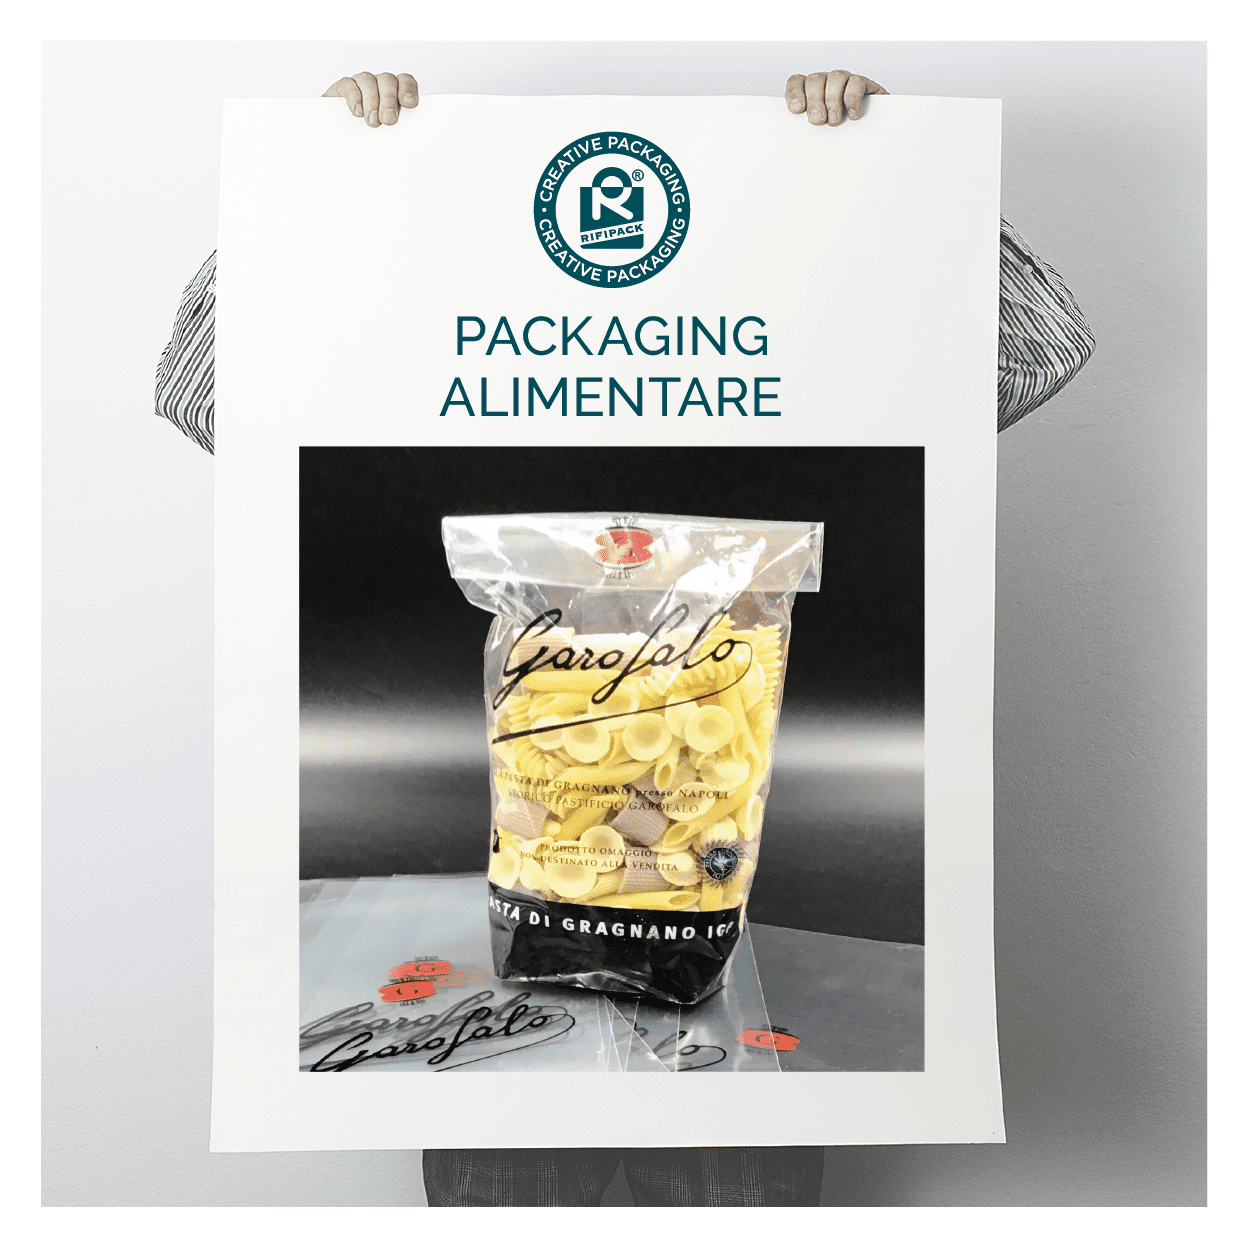 rifipack packaging alimentare buste pasta sacchetti trasparenti food alimenti